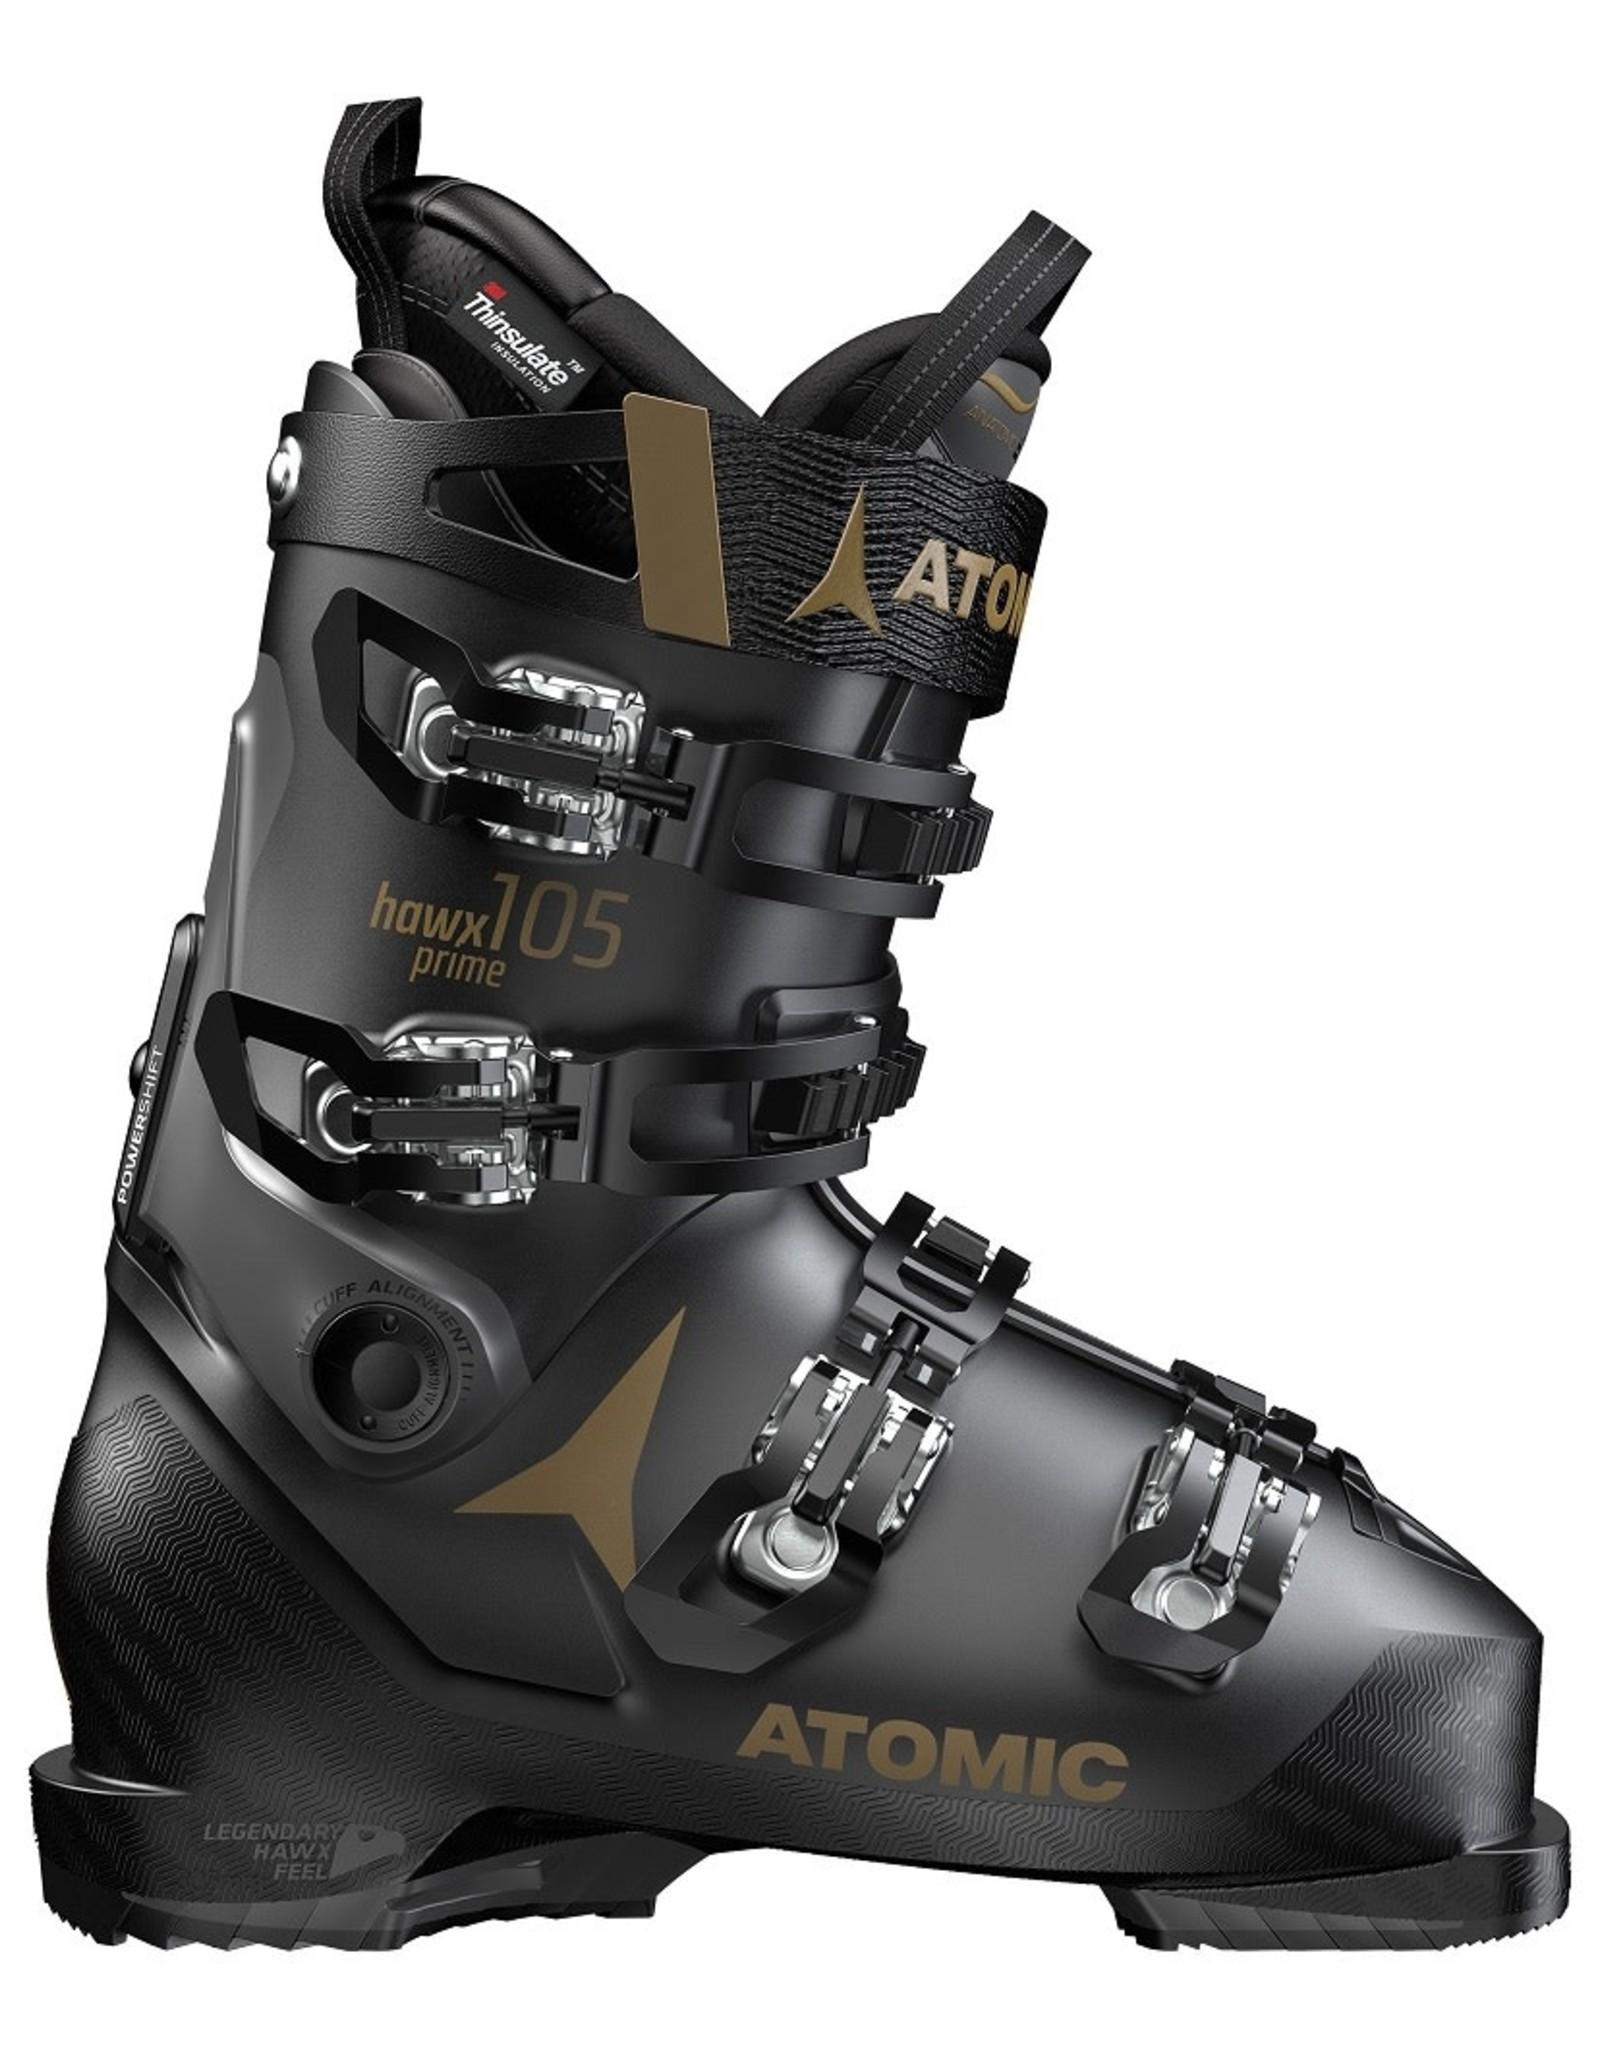 ATOMIC ATOMIC Ski Boots HAWX PRIME 105 S W (19/20)